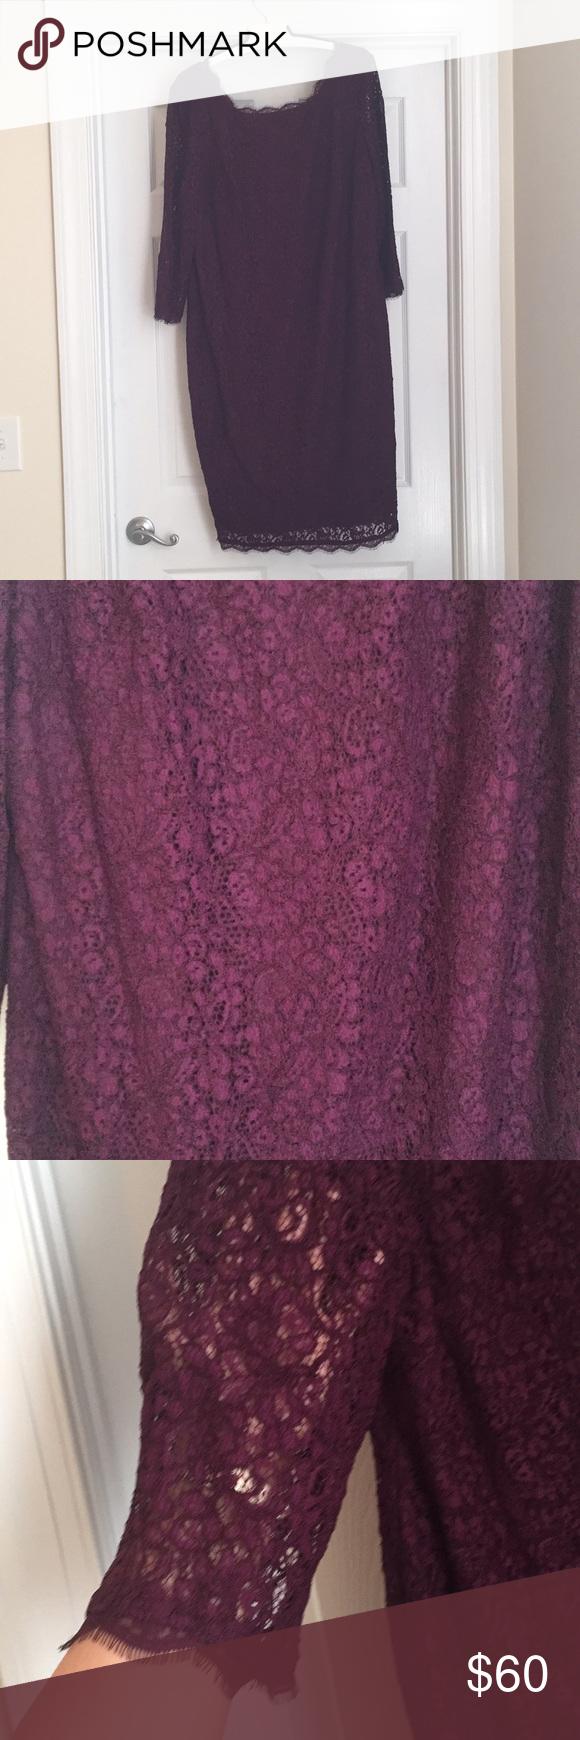 Adrianna Papell Plum Lace Overlay dress